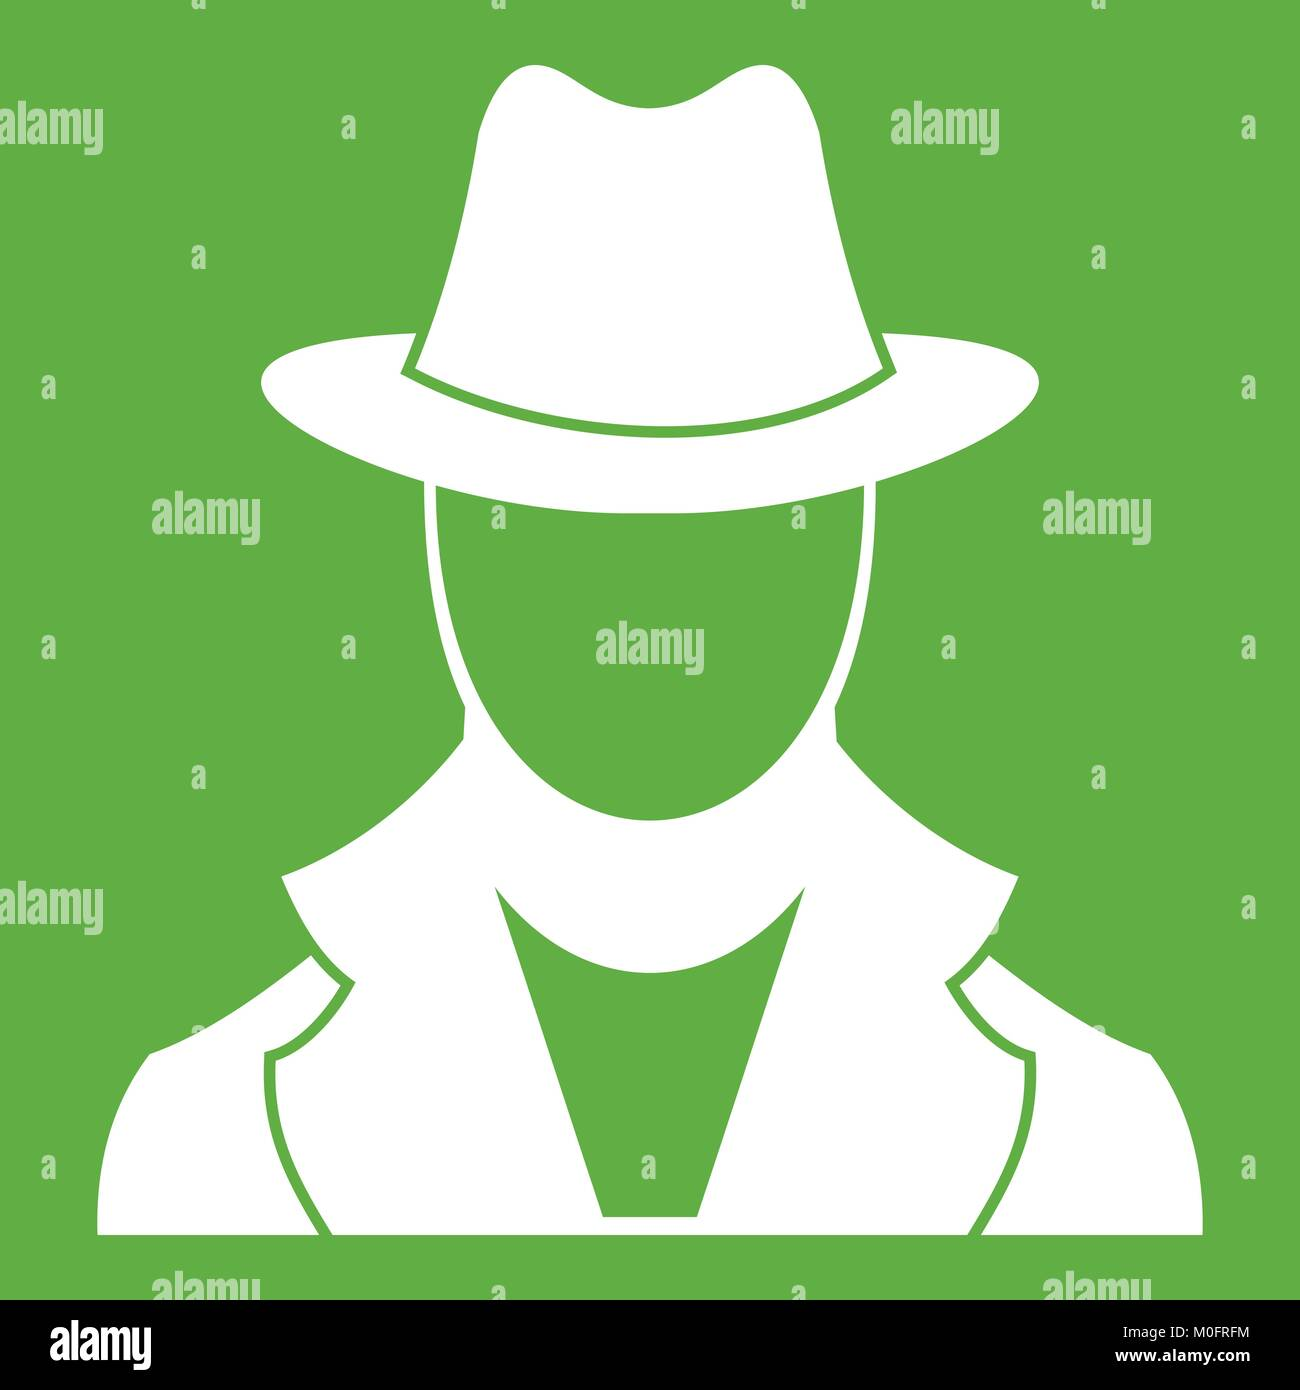 Spy icon green - Stock Vector